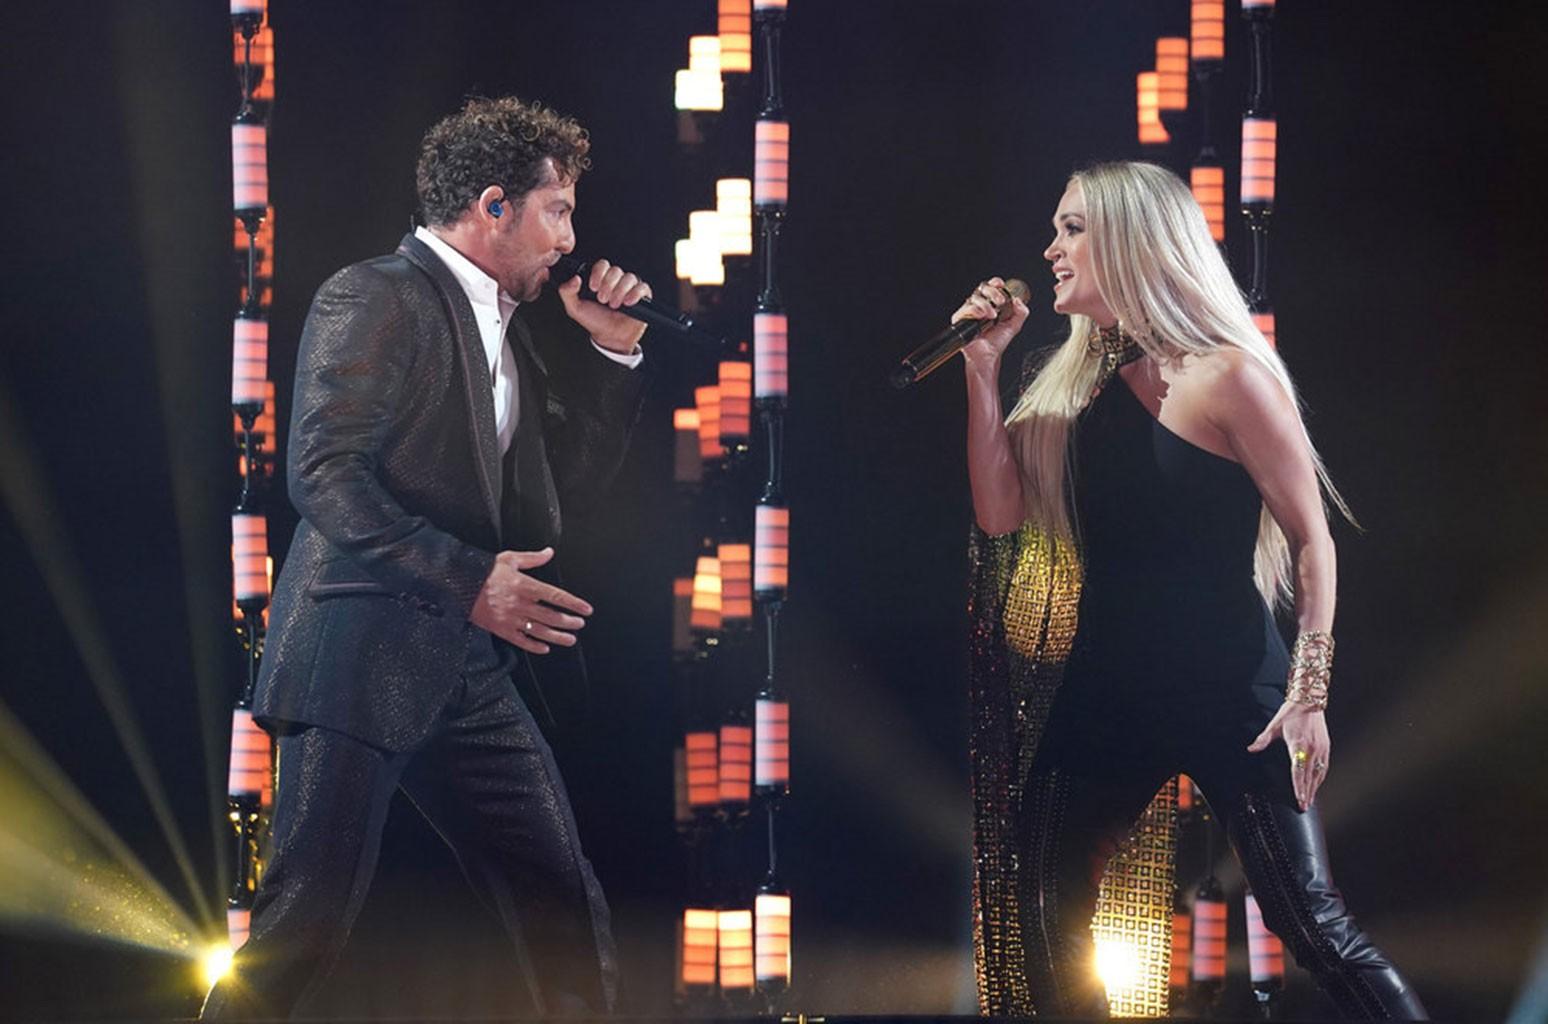 David Bisbal, Carrie Underwood